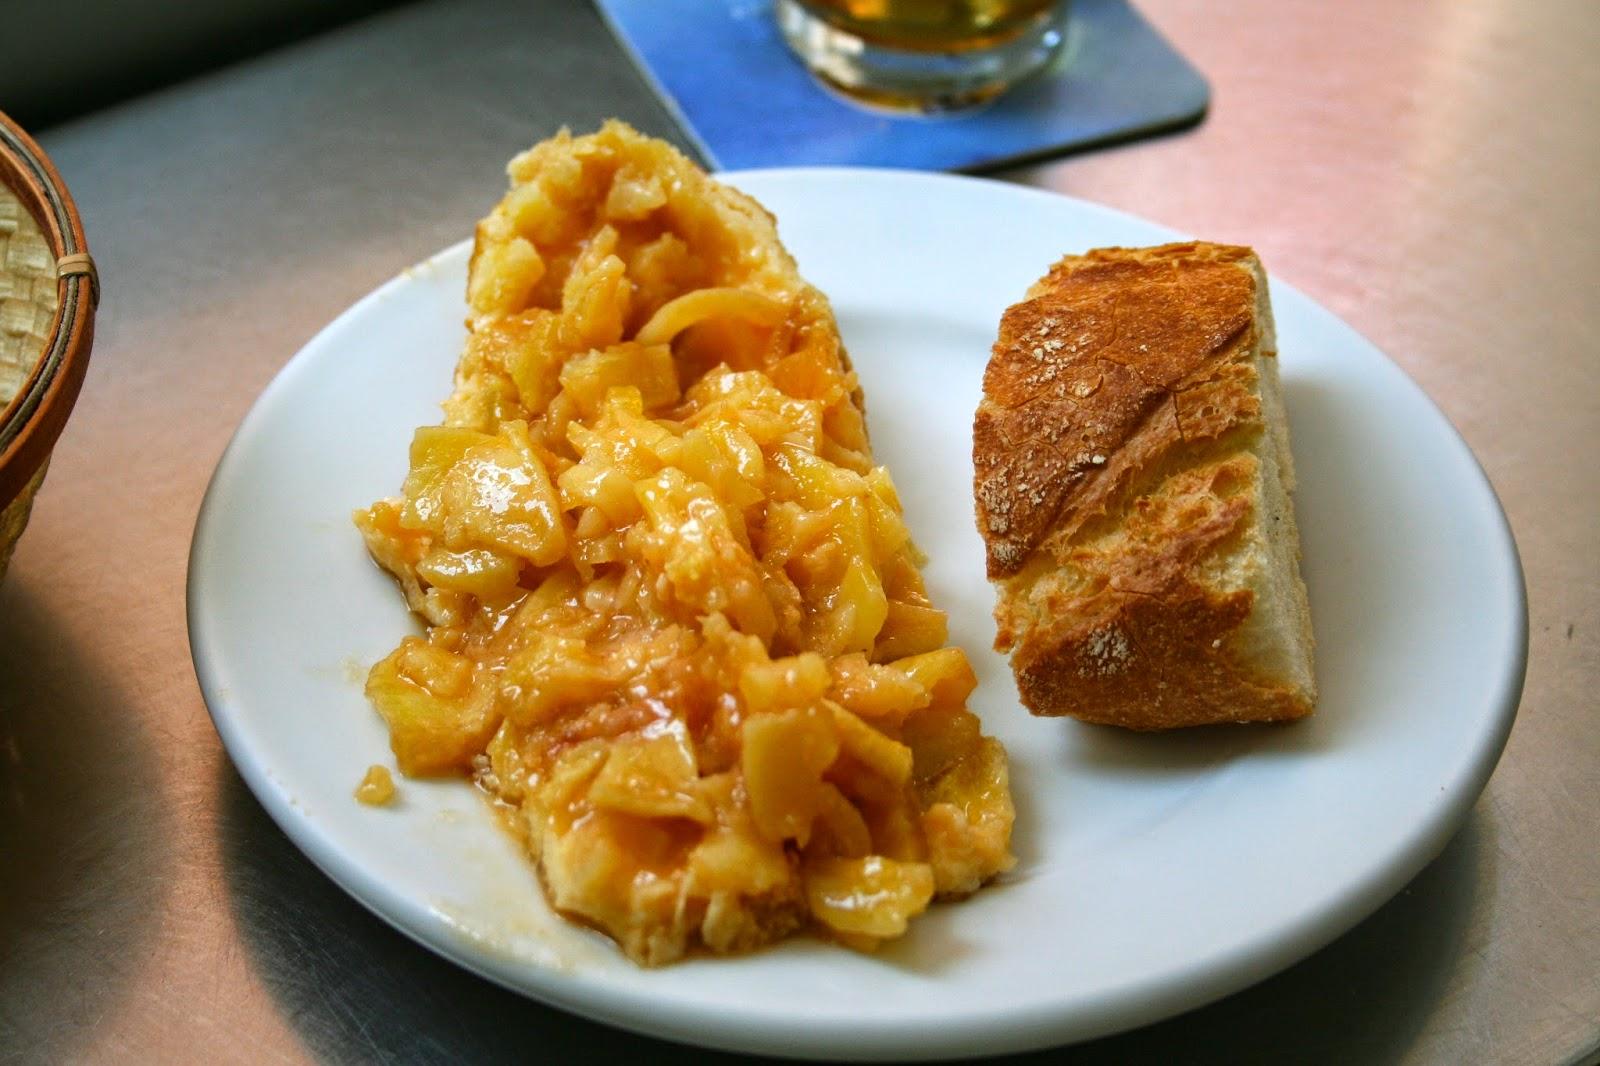 Tortilla de patatas - bar alhambra - valencia - exquisita